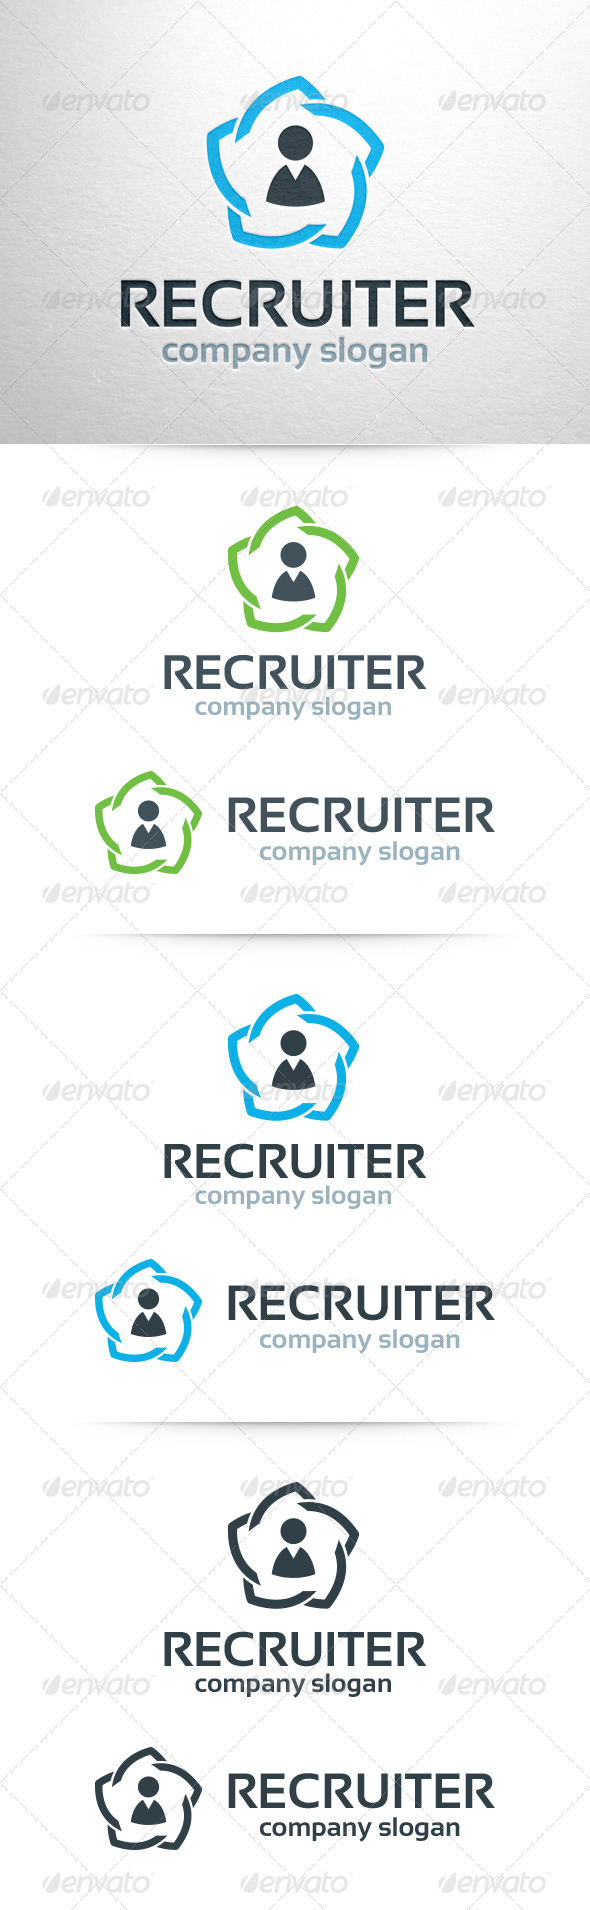 GraphicRiver Recruiter Logo Template 6796925